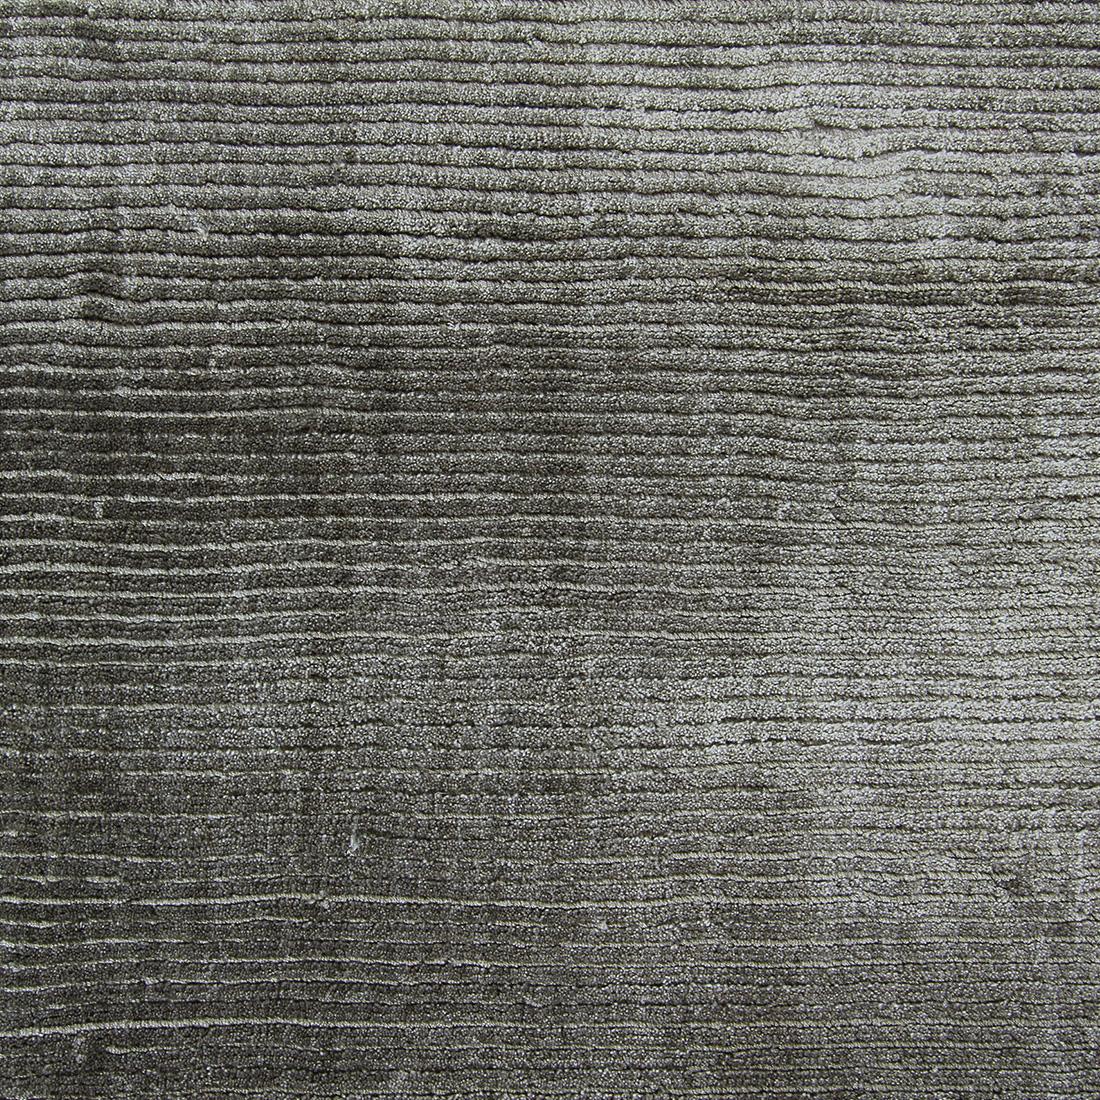 Vloerkleed Brinker Oyster Light Brown | 240 x 340 cm